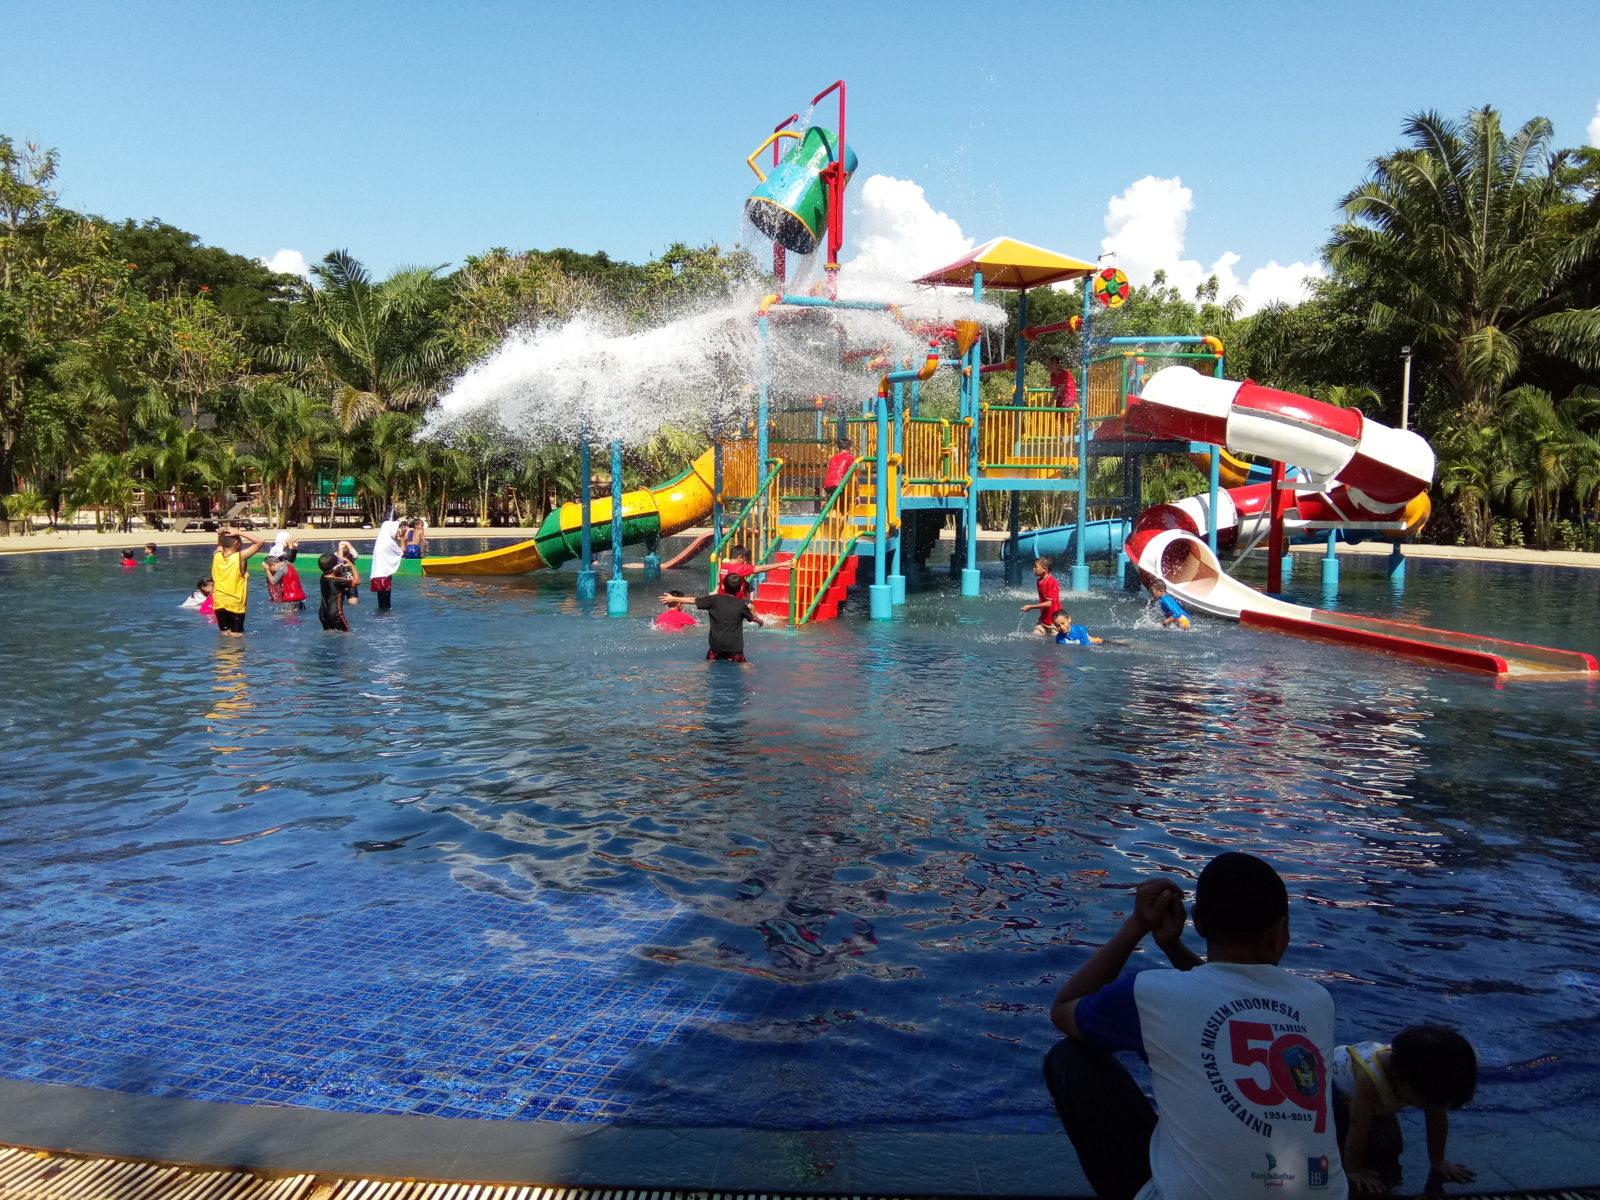 Gowa Discovery Park Tiket Aktivitas April 2021 Travelspromo